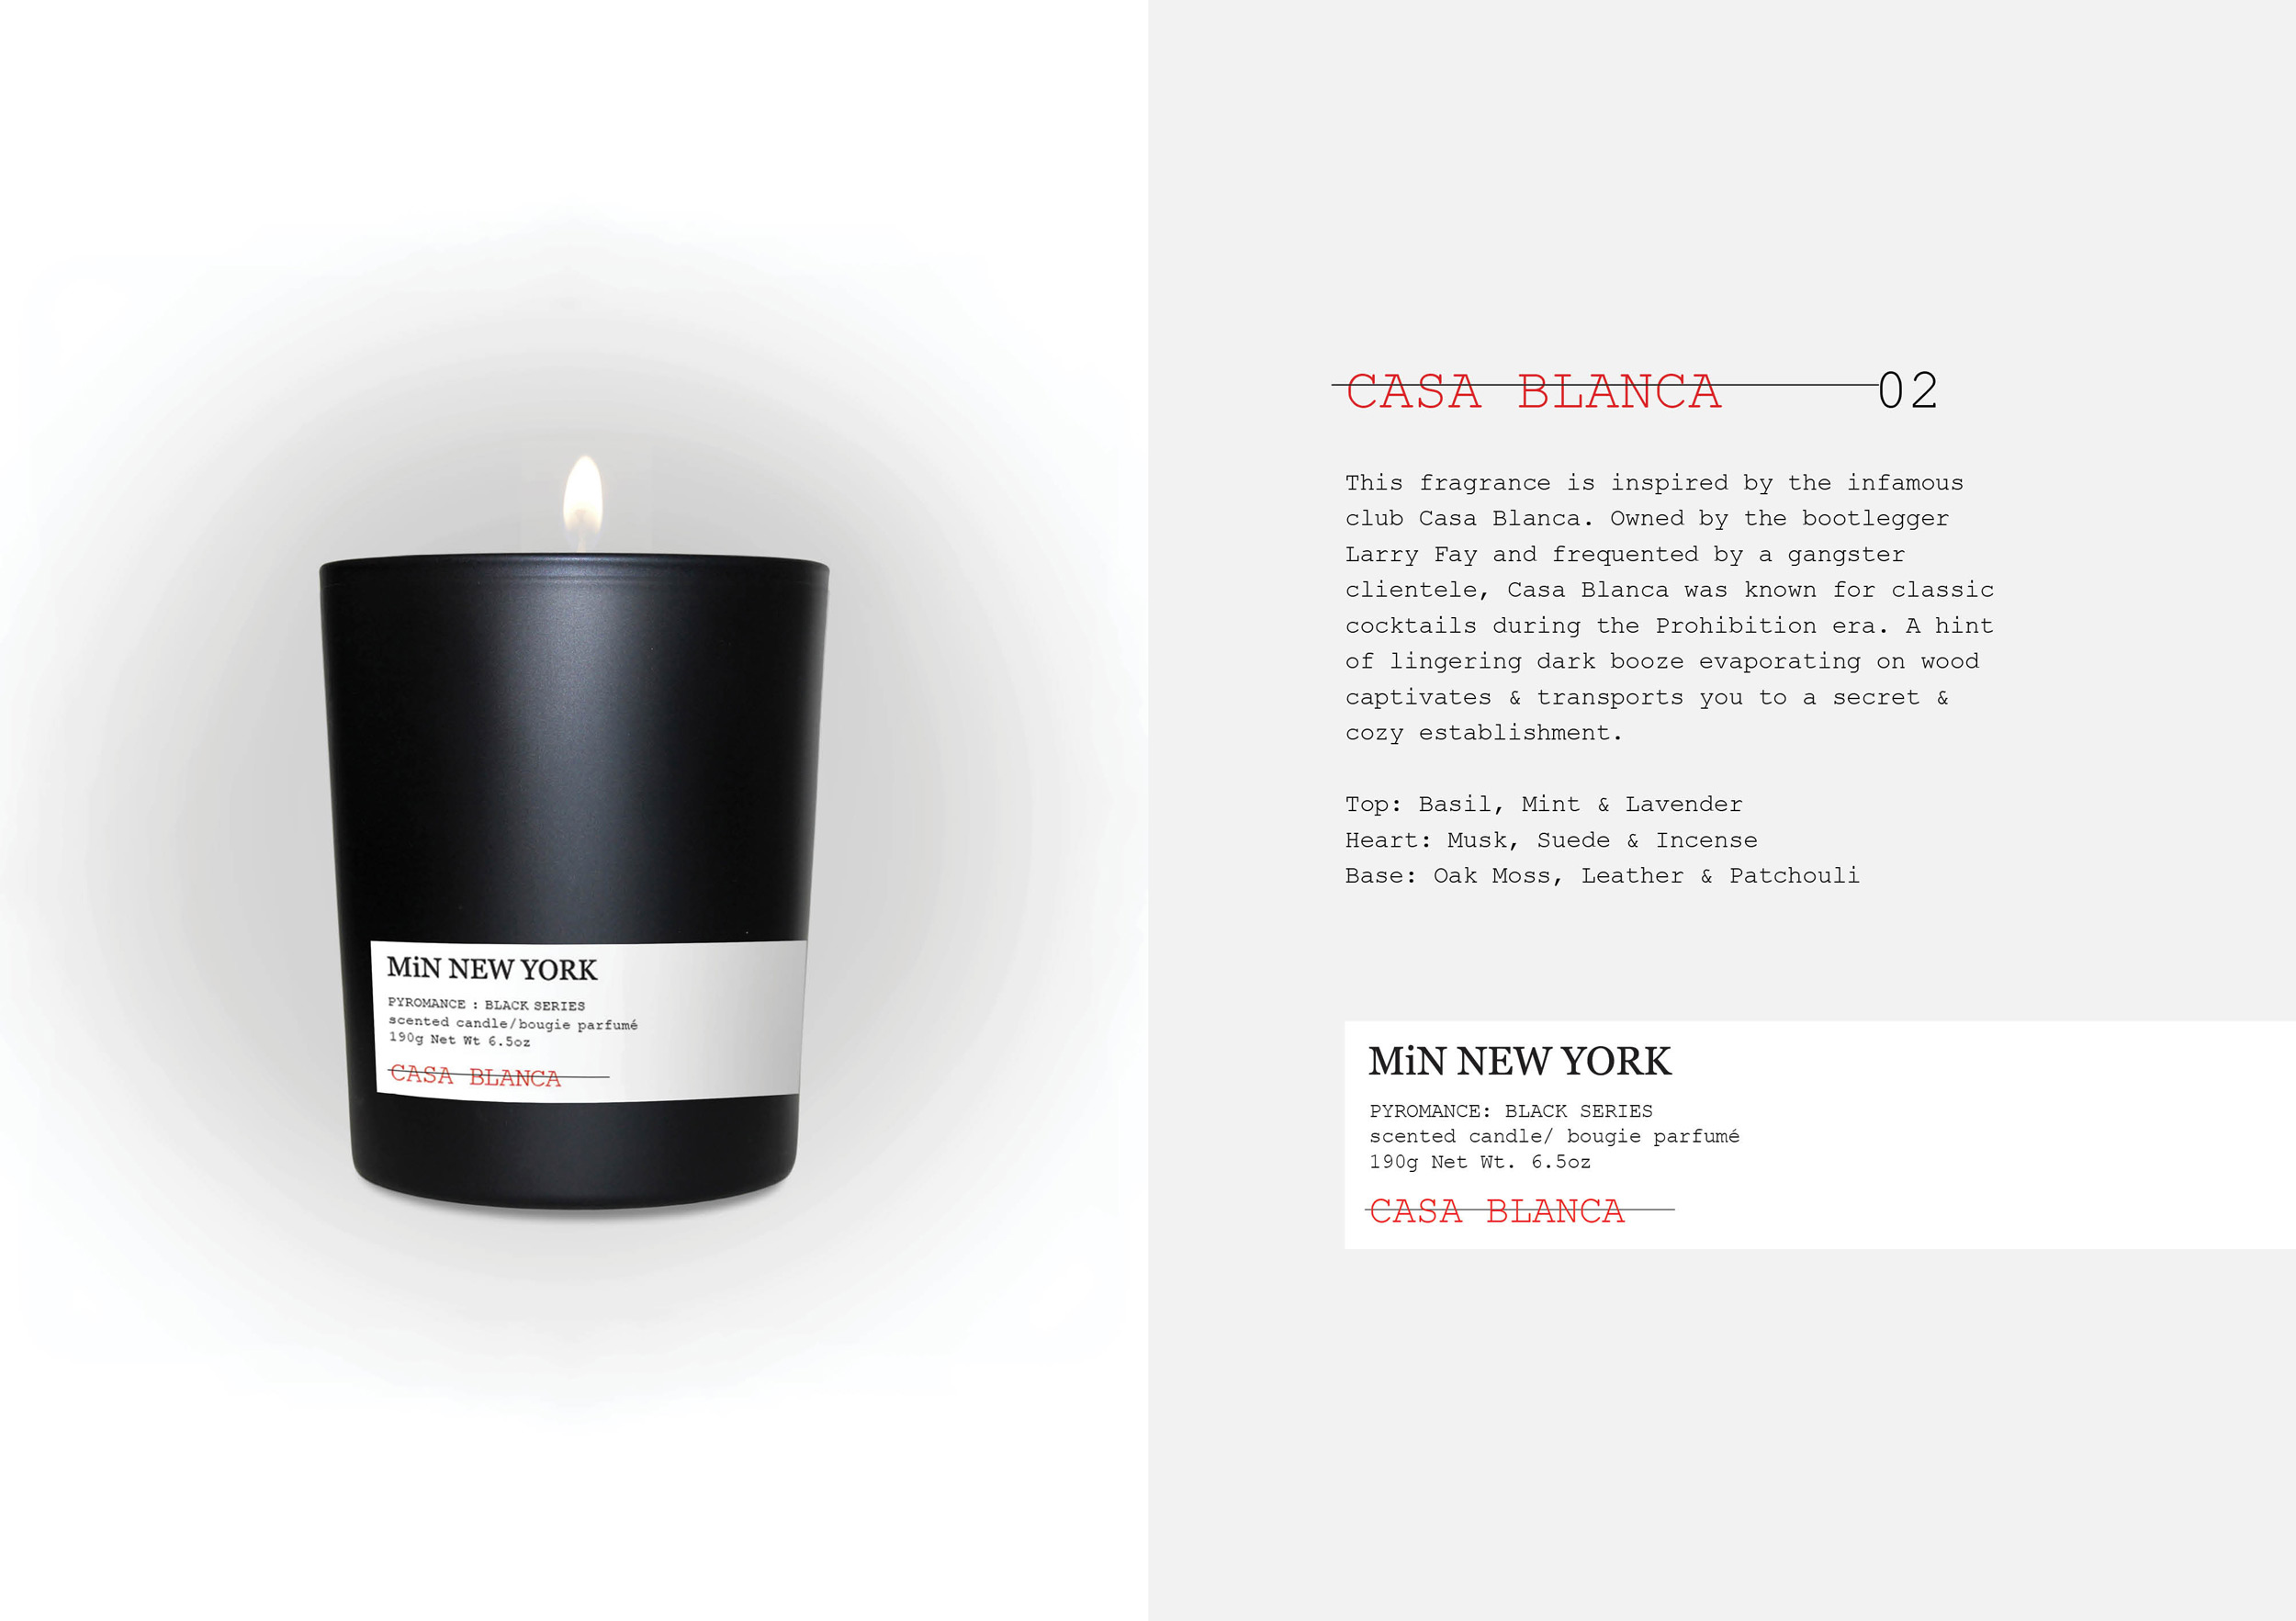 chad murawczyk MiN New York Pyromance black series casa blanca.jpg